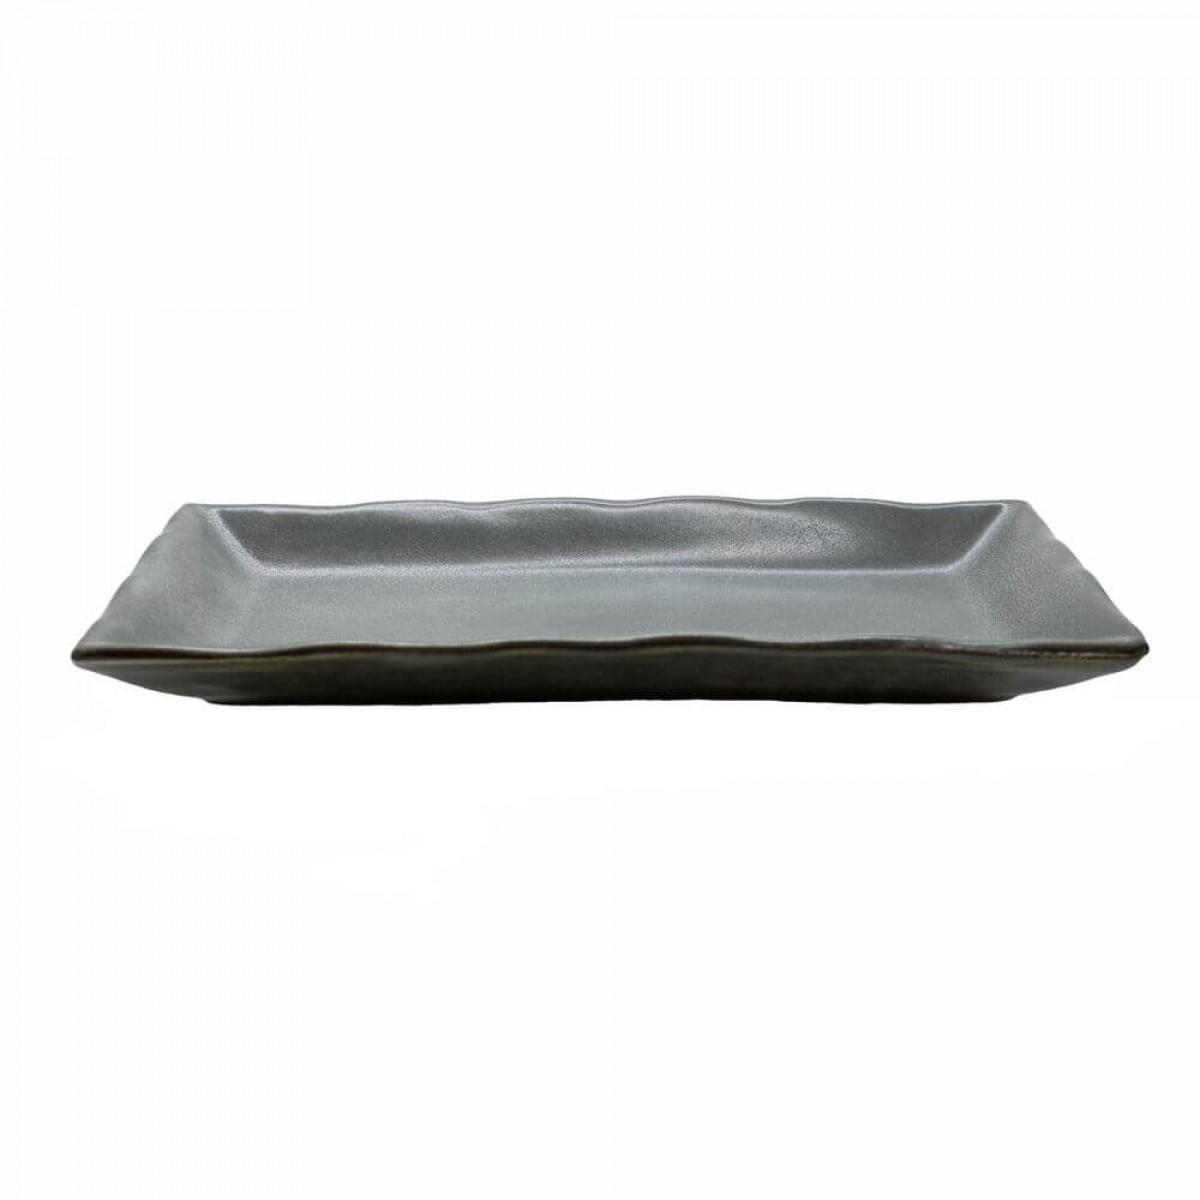 DACORE Fad stentøj 25x12 cm grå